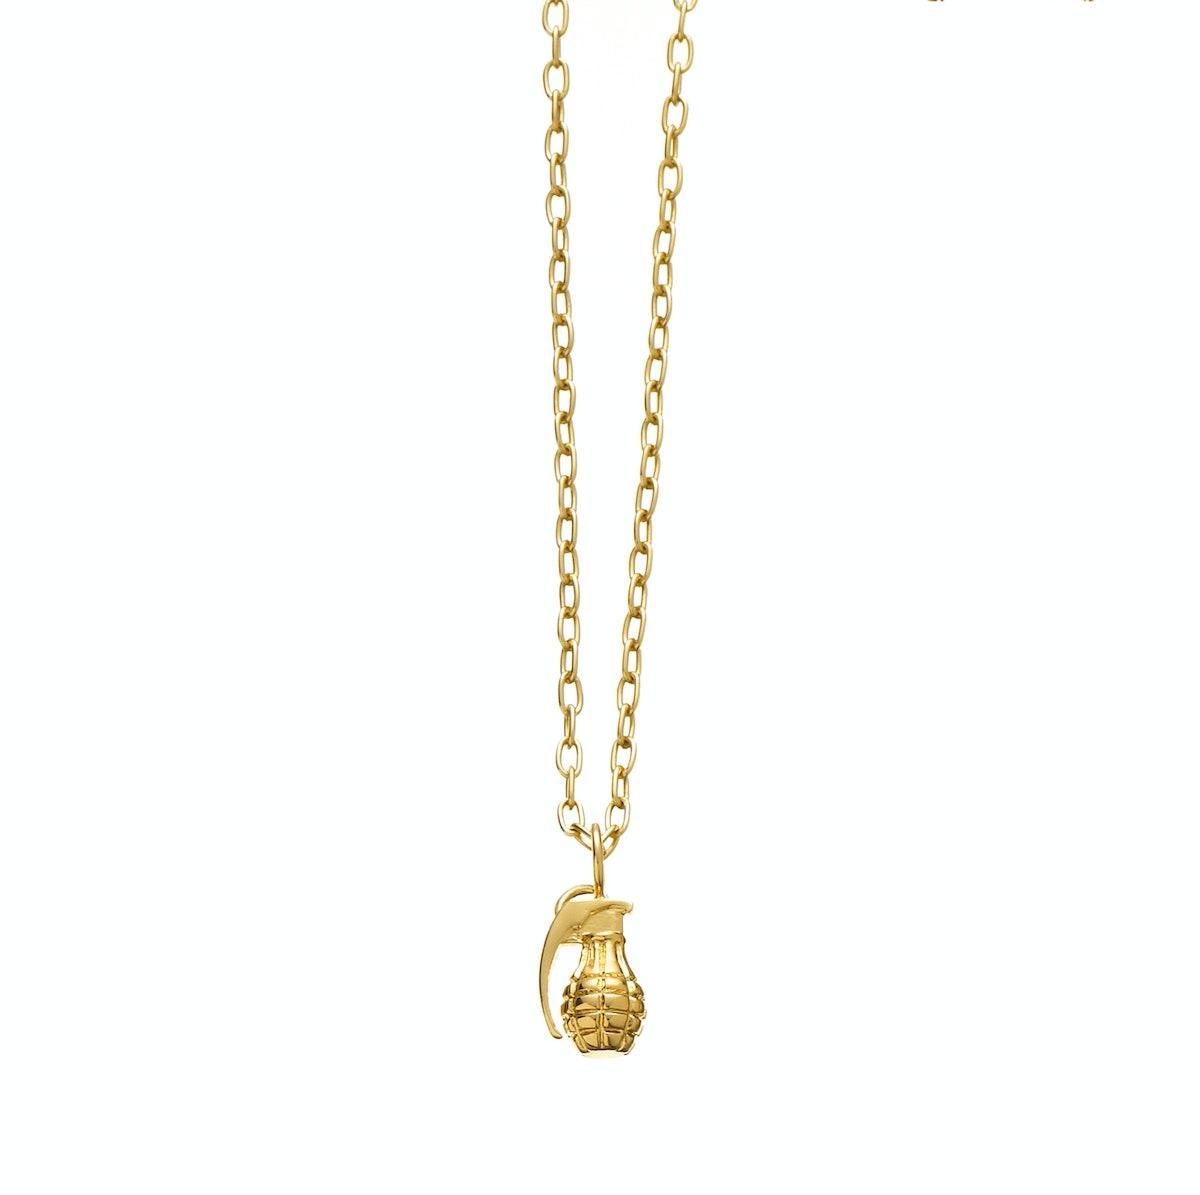 Jennifer Fisher 14K gold grenade charm necklace